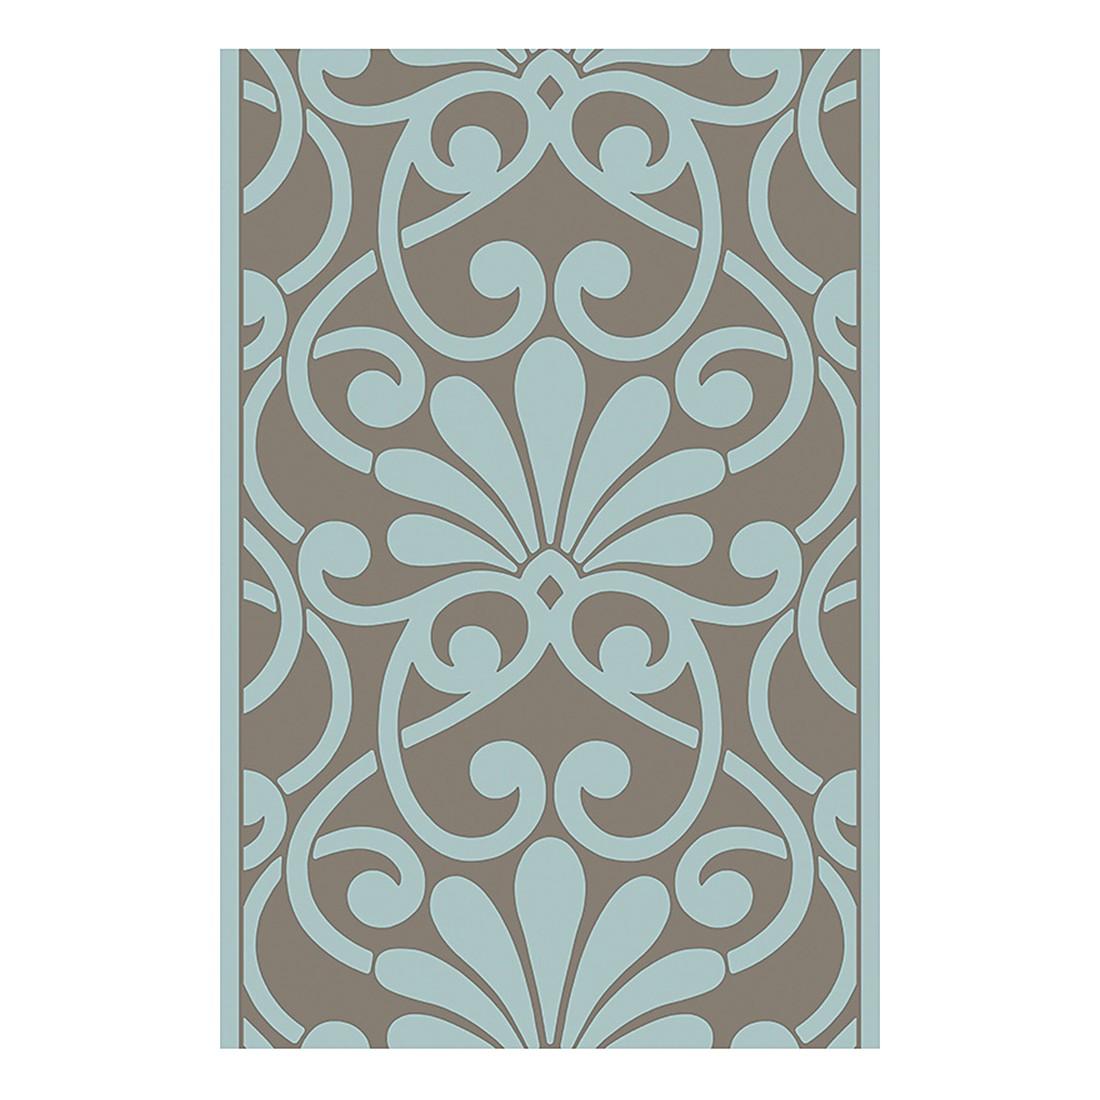 pop.up Panel Funny Ornament – türkis – braun – selbstklebend – glatt, Livingwalls jetzt bestellen